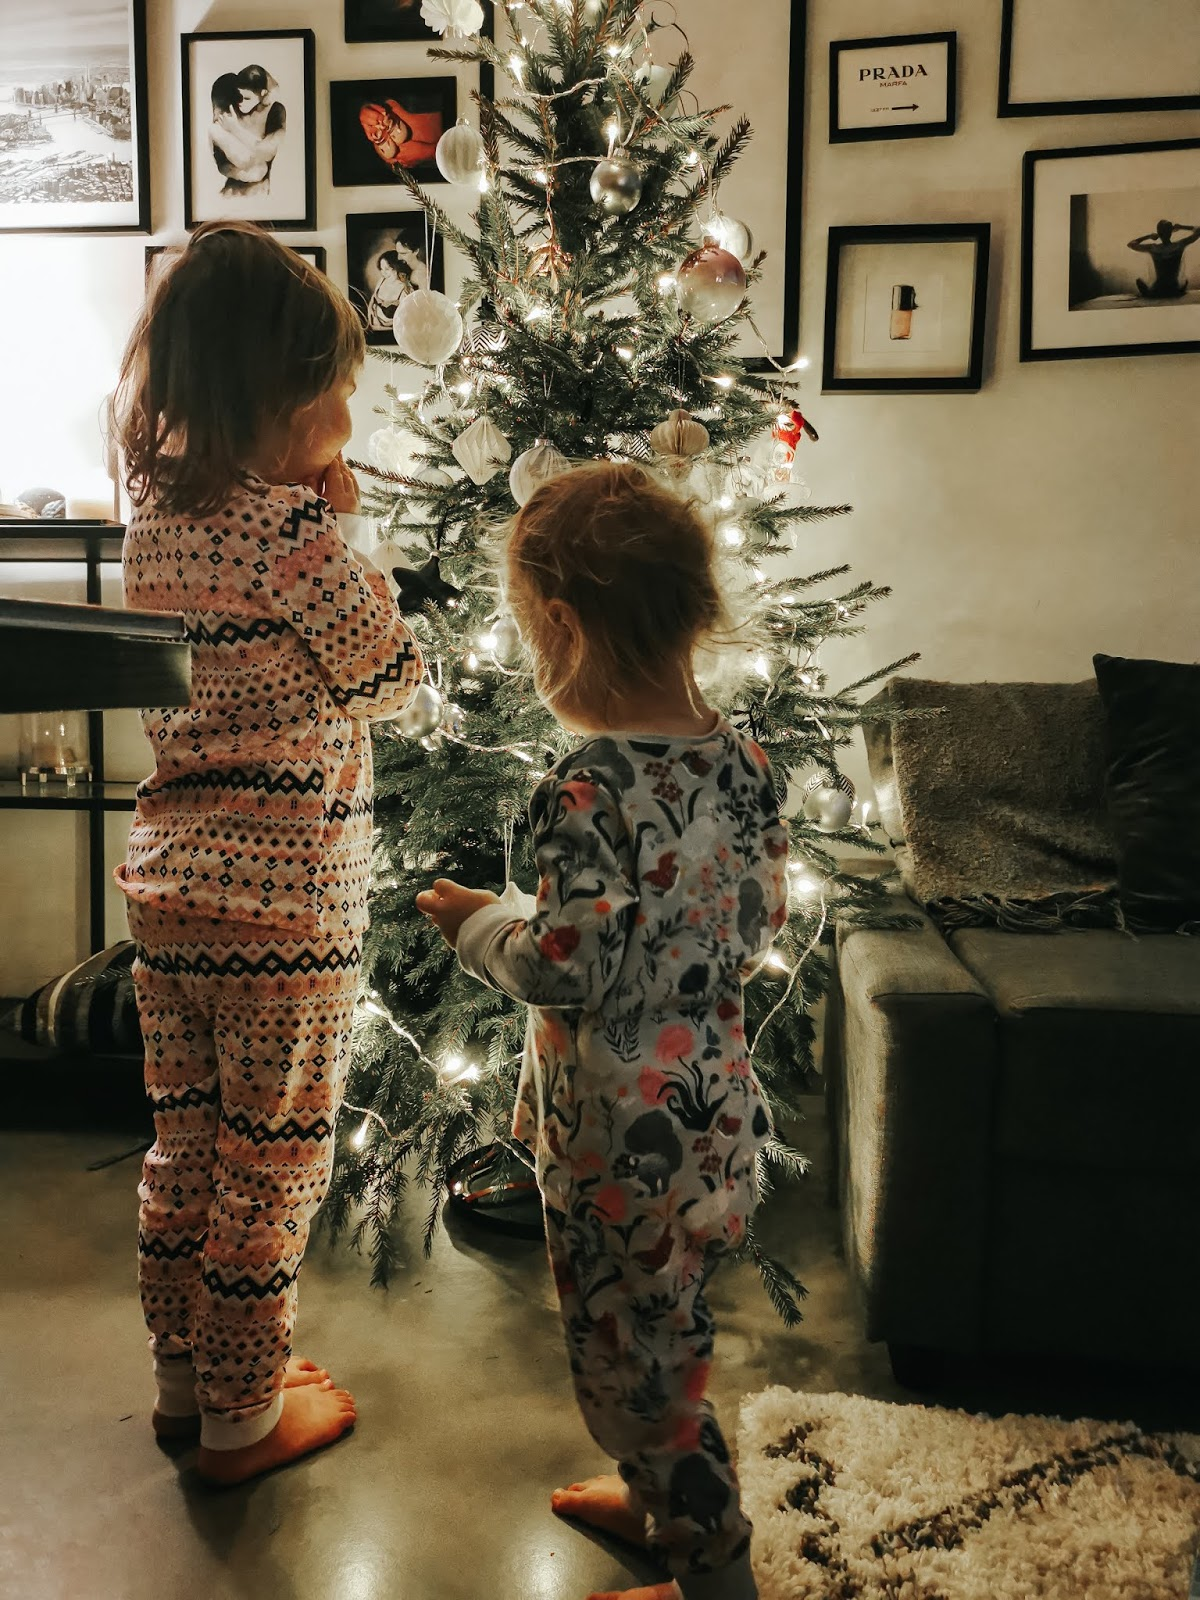 Big mamas home by Jenni S. Hyvää joulua